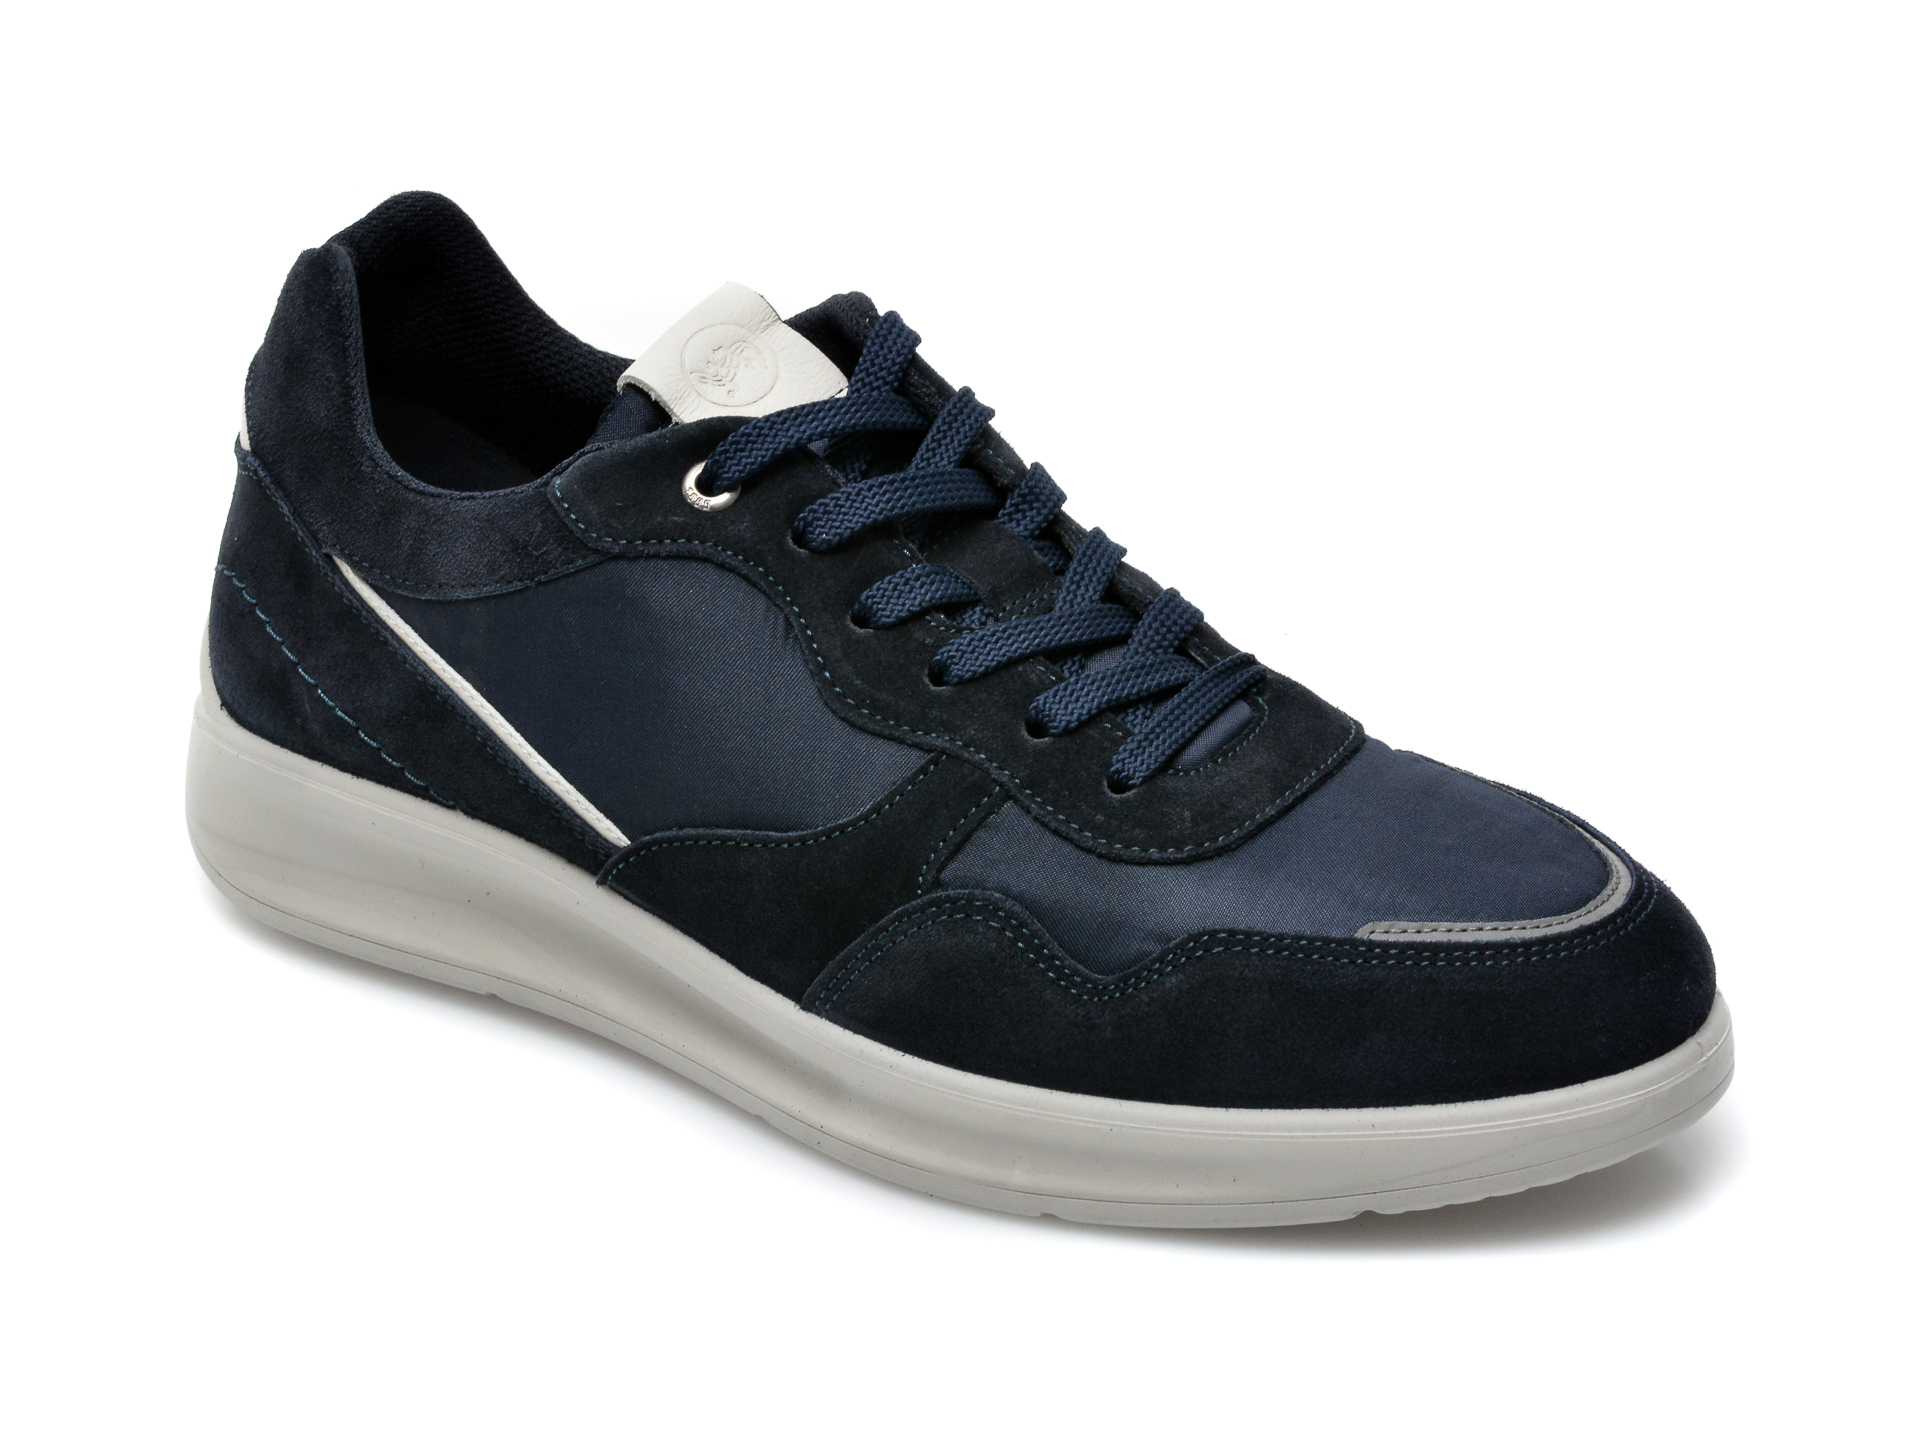 Pantofi SALAMANDER bleumarin, 50901, din material textil si piele naturala imagine 2021 otter.ro